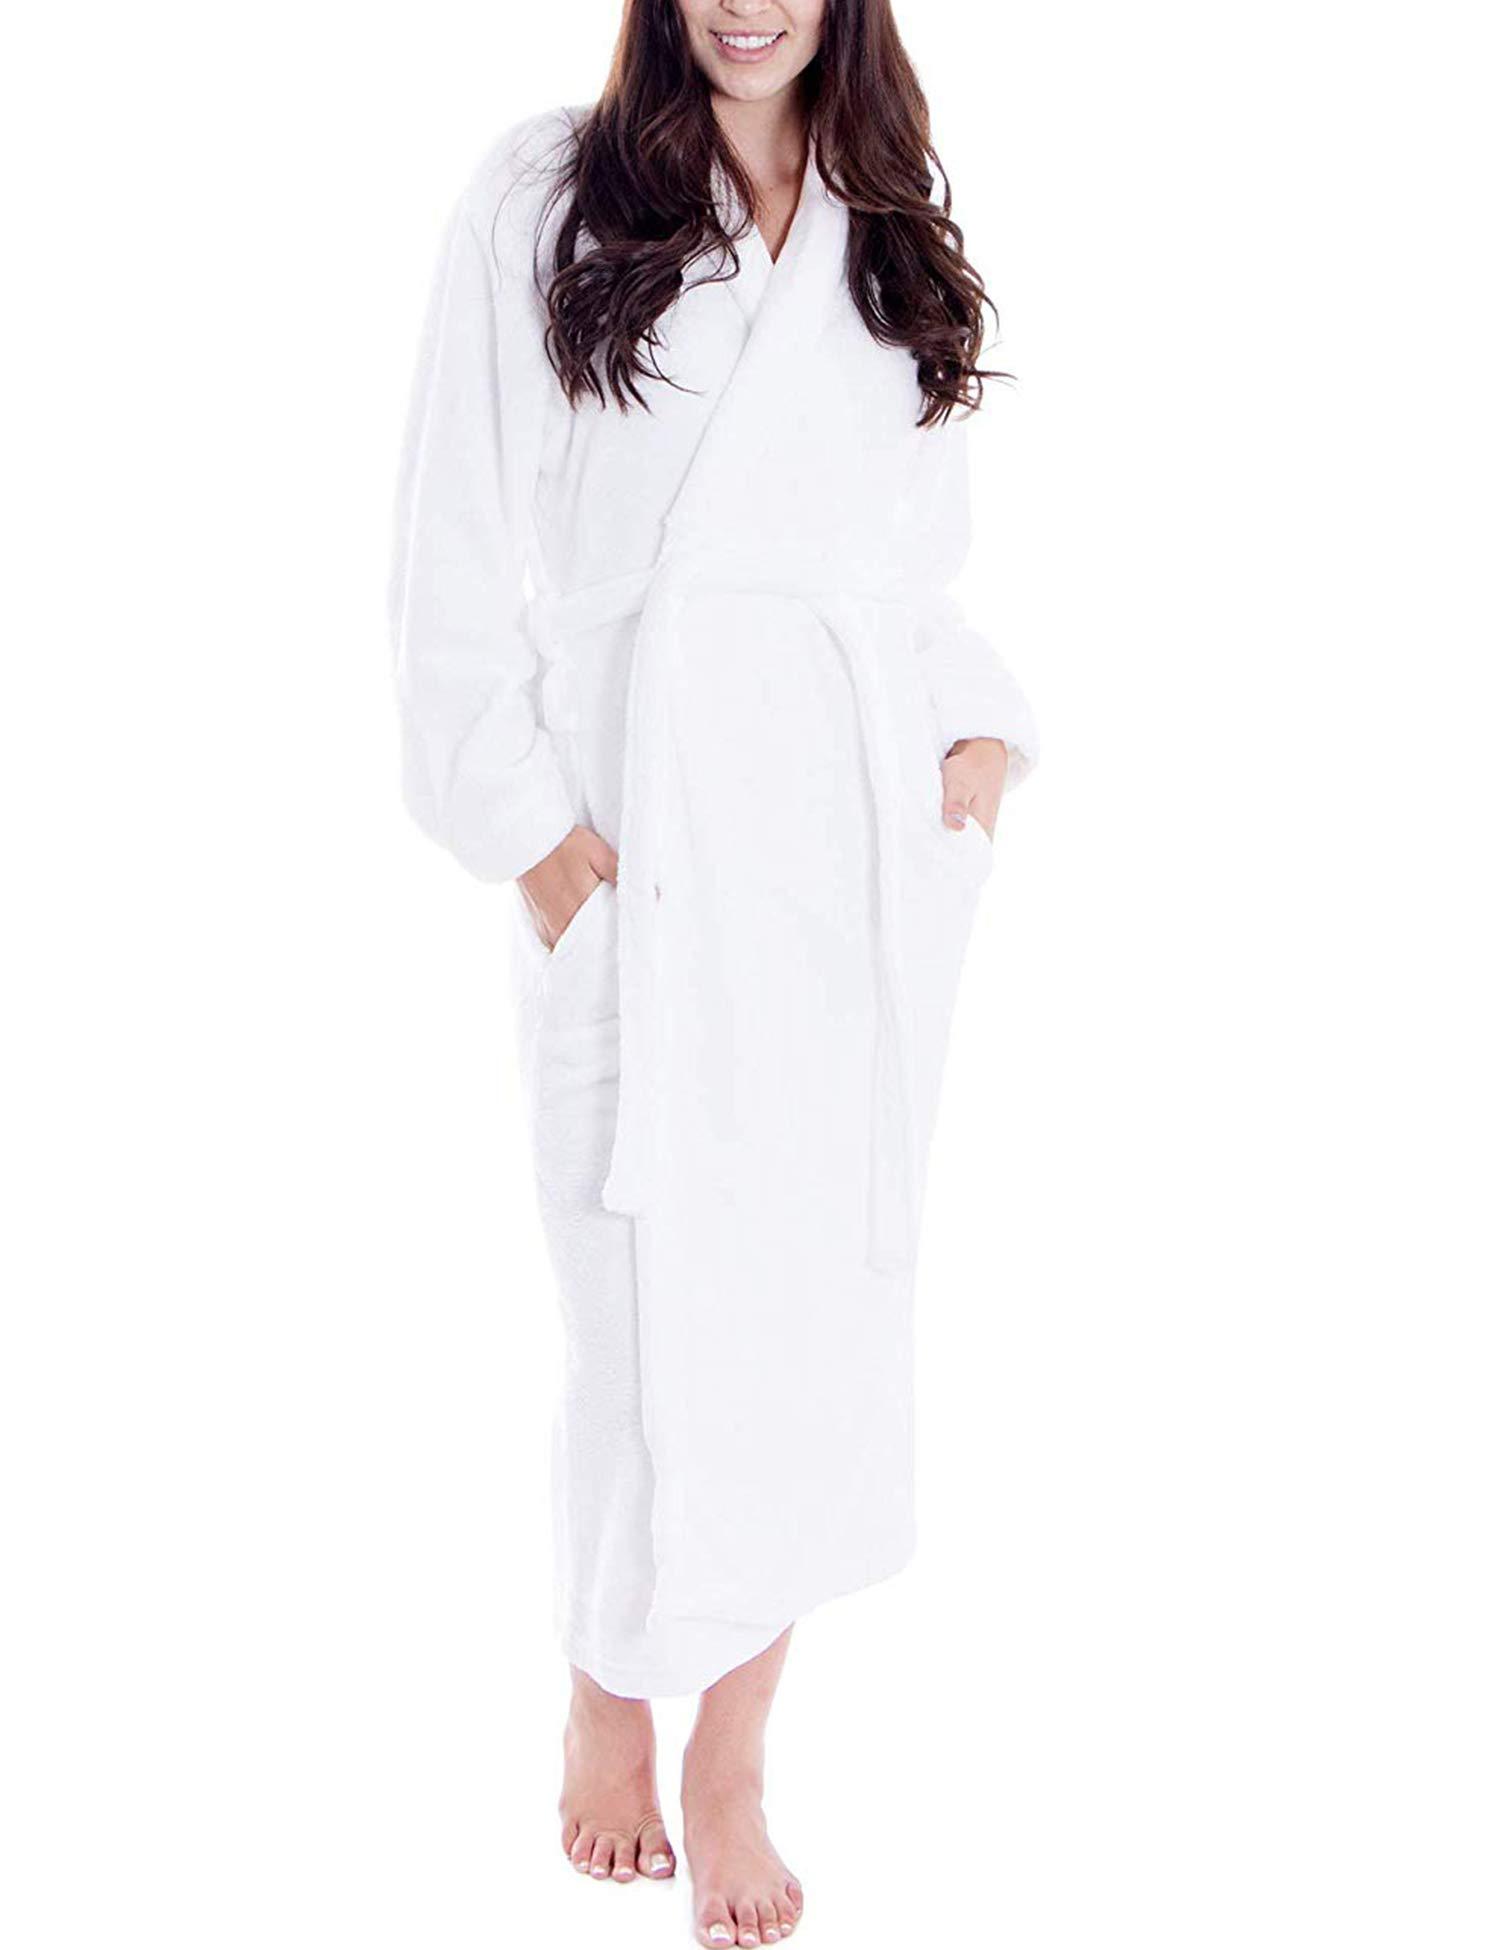 wearella Kimono Bathrobes for Women Spa Robes Unisex Organic Cotton Bathrobe Womens Loungewear Sleepwear White M